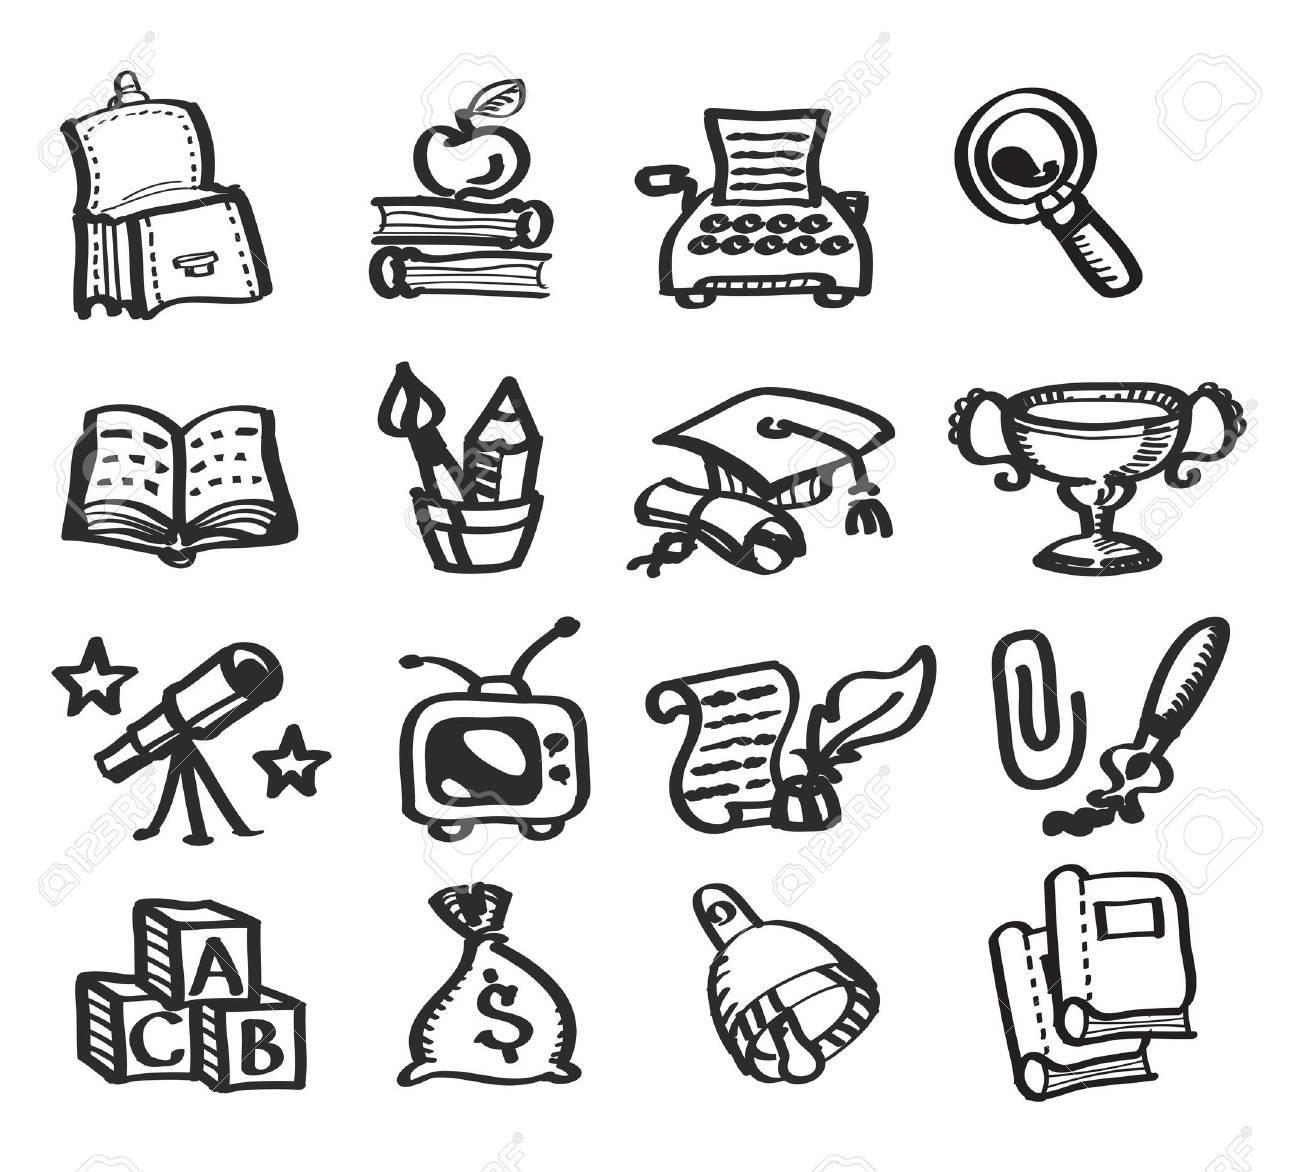 Education illustration - 19972932